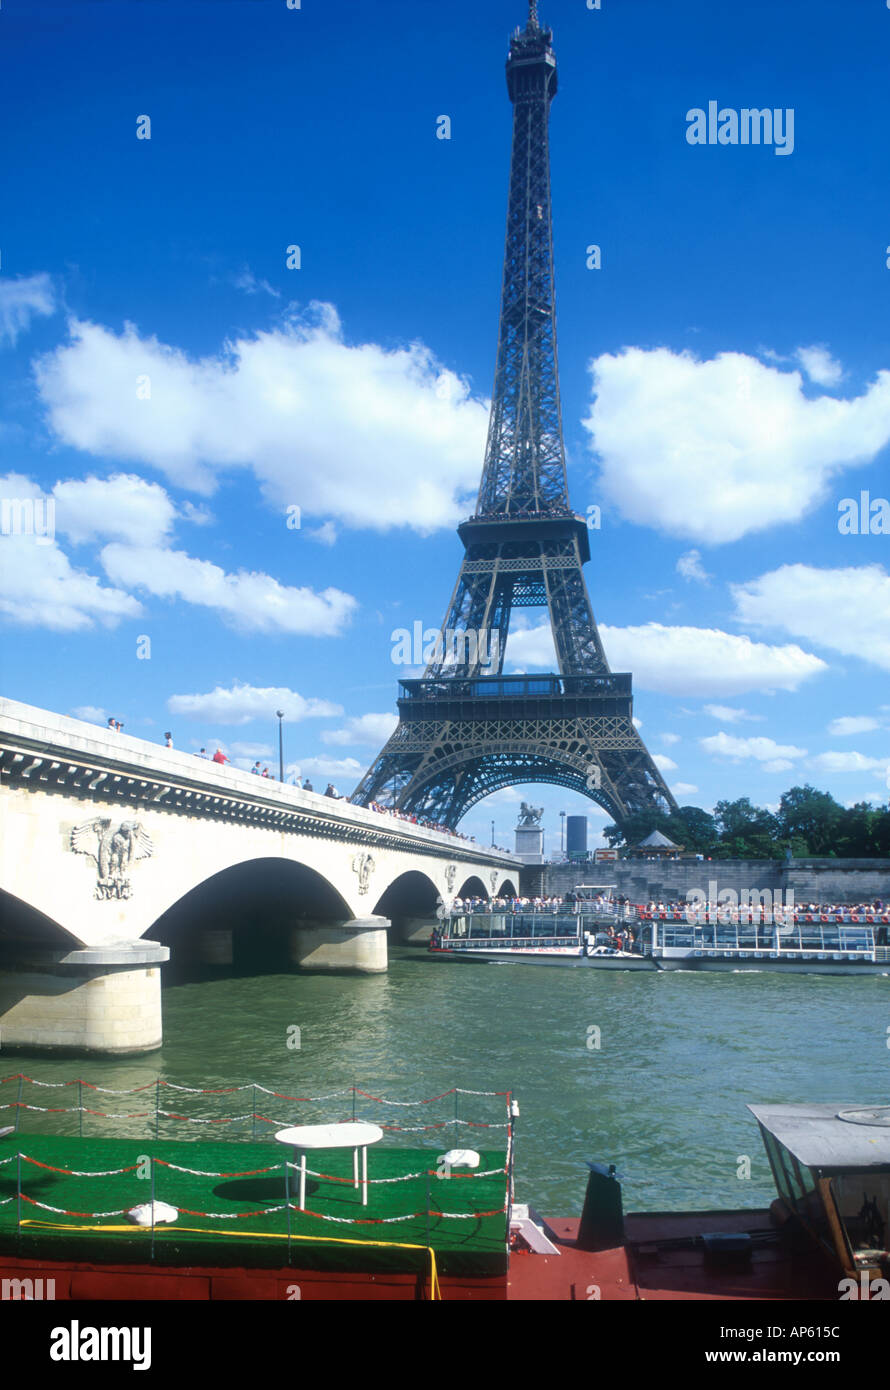 River Seine Pont d Iéna sightseeing boat Eiffel Tower Tour Eiffel Paris France Europe  Stock Photo